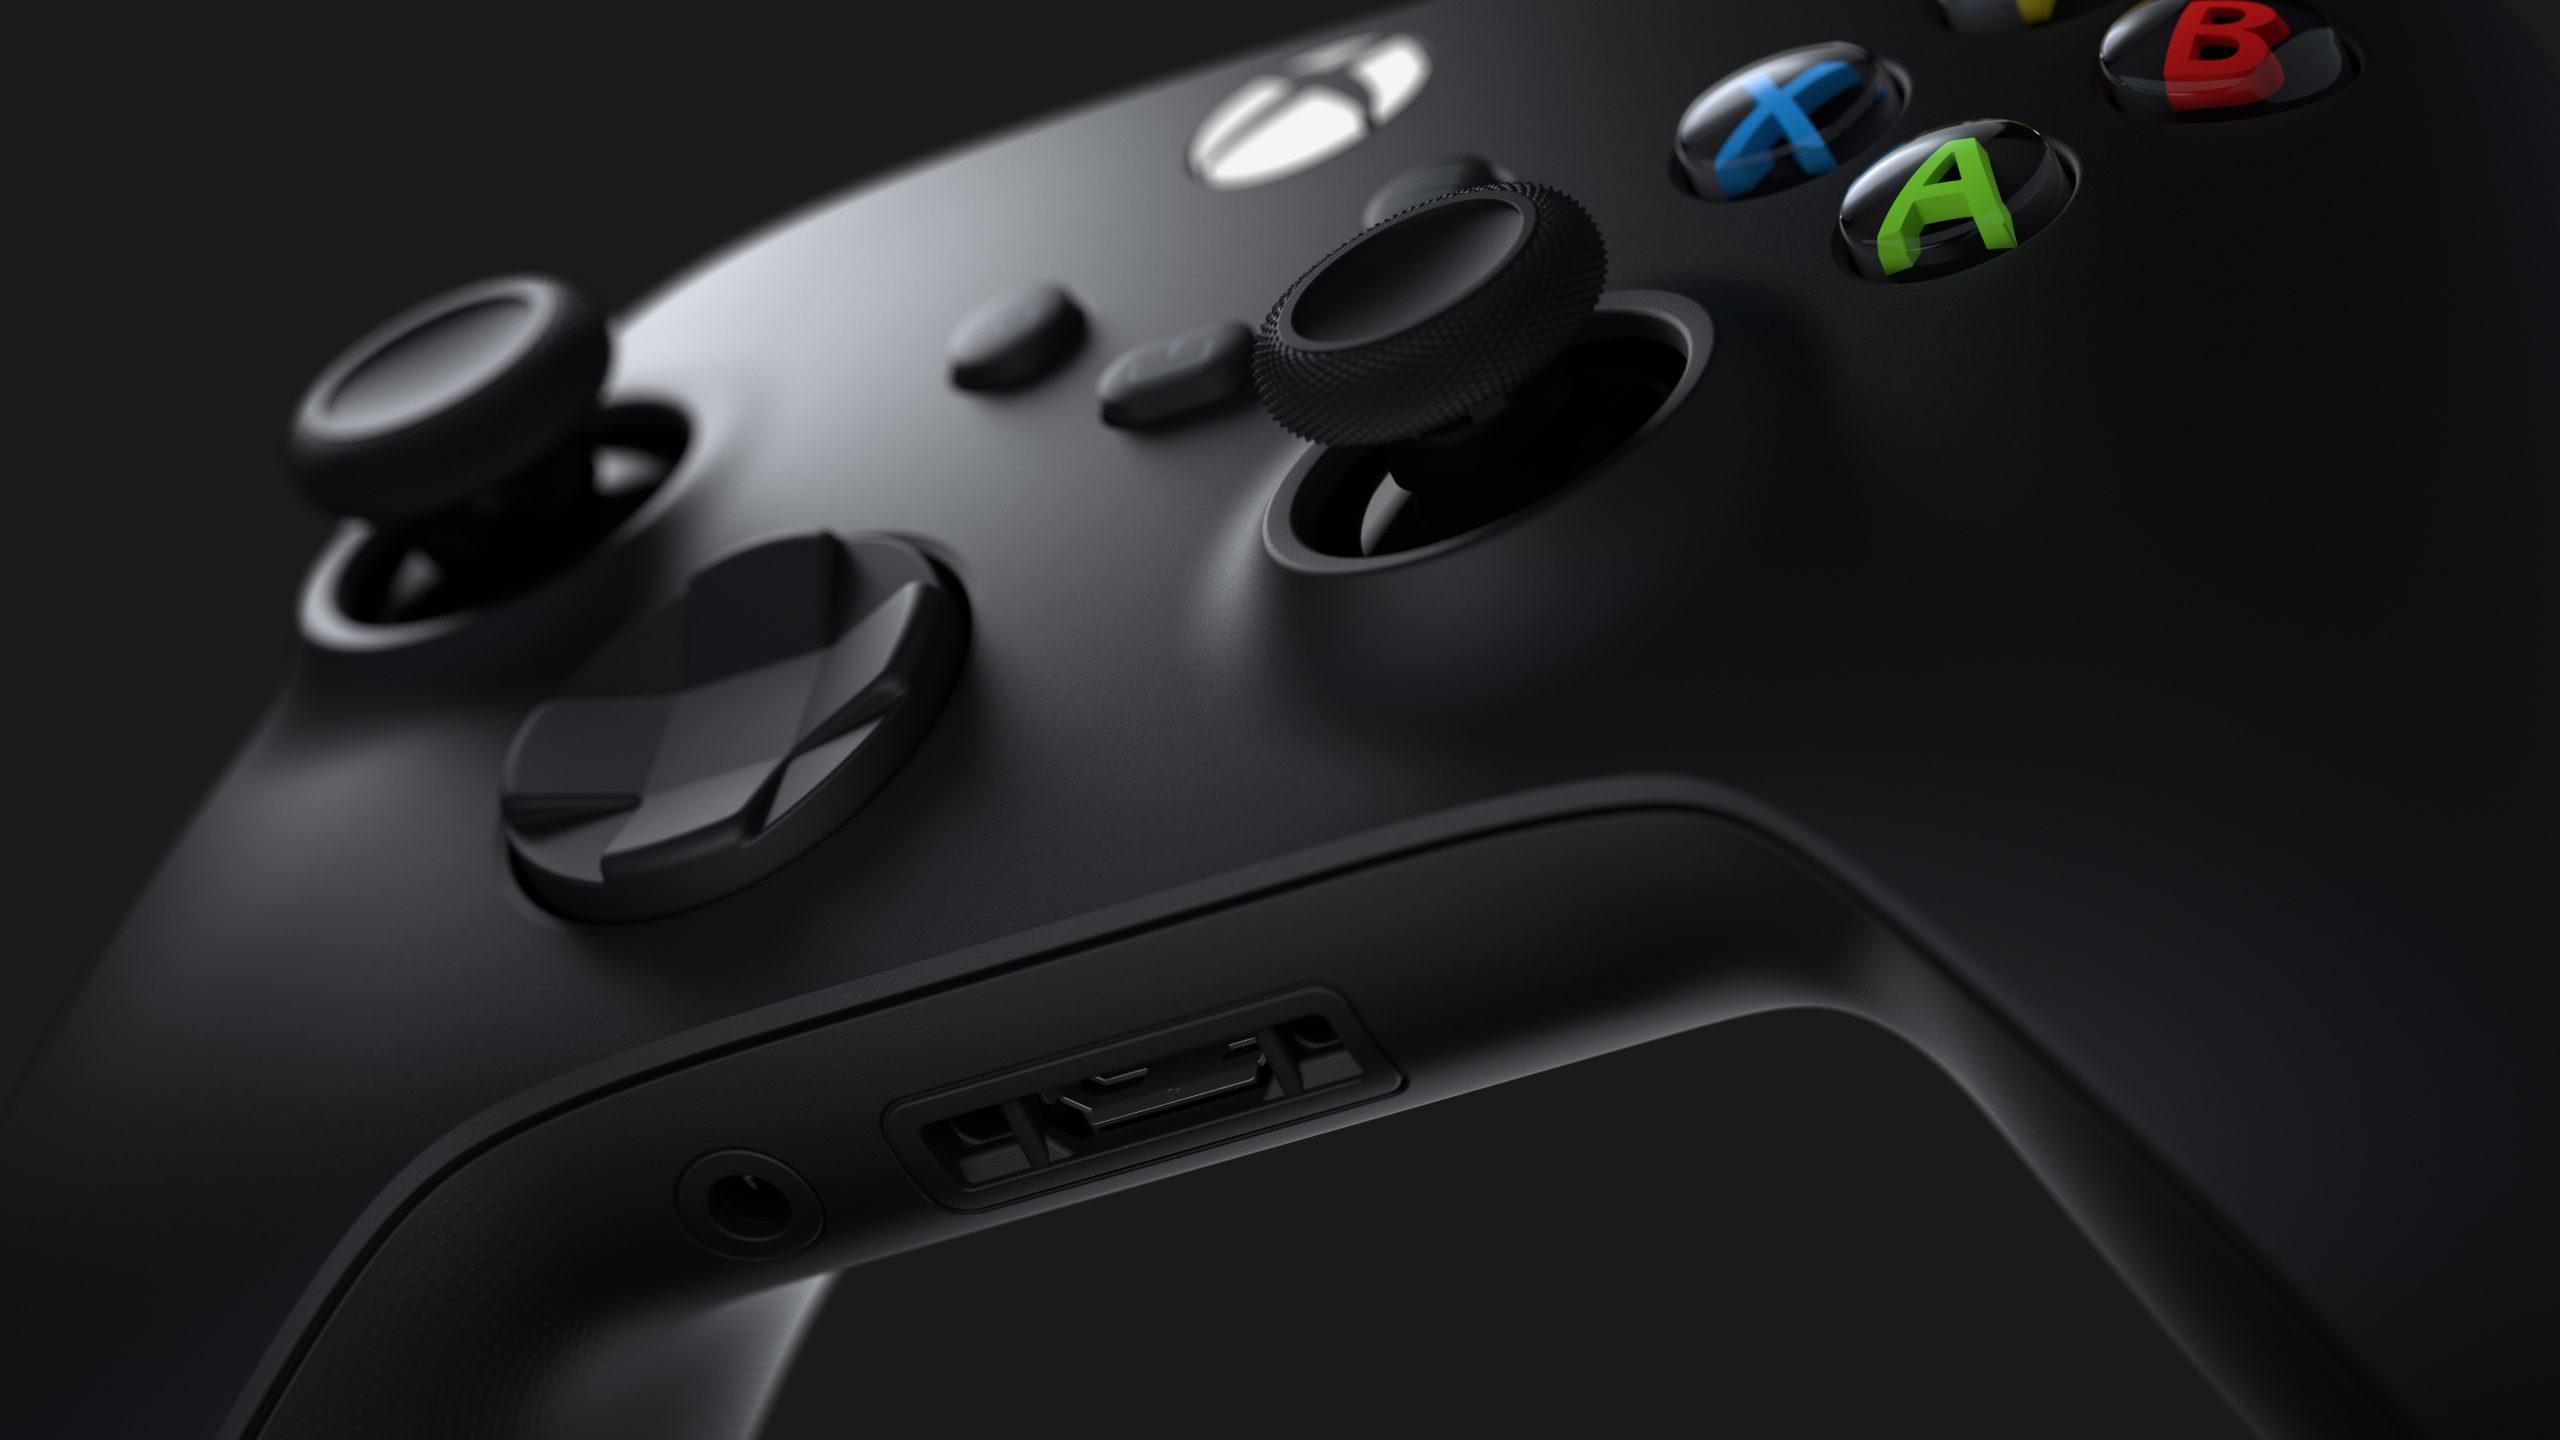 Microsoft confirma sucesso da Xbox Series X e ultrapassa 18 milhões no Xbox Game Pass